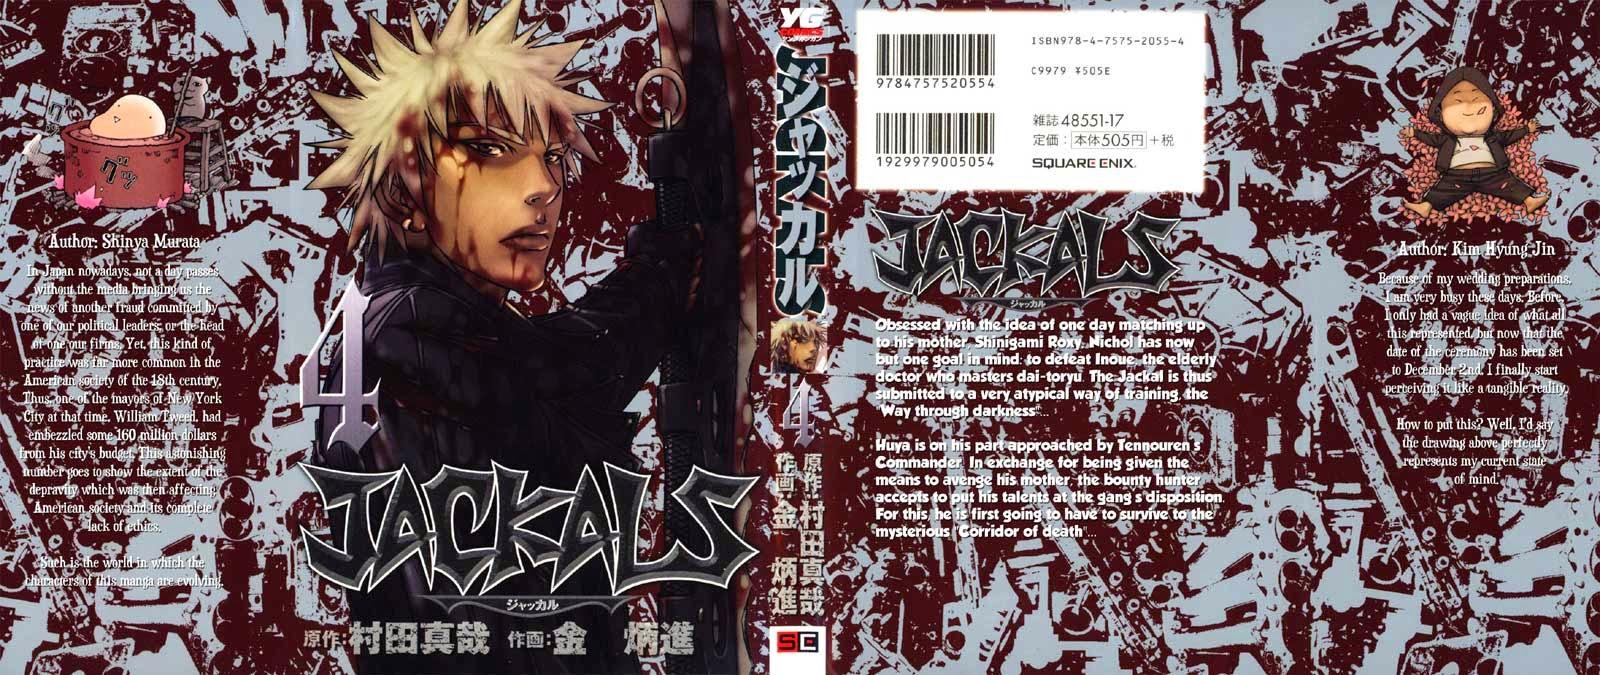 Dilarang COPAS - situs resmi http://mangaku.web.id - Komik jackals 024 - chapter 24 25 Indonesia jackals 024 - chapter 24 Terbaru 1|Baca Manga Komik Indonesia|